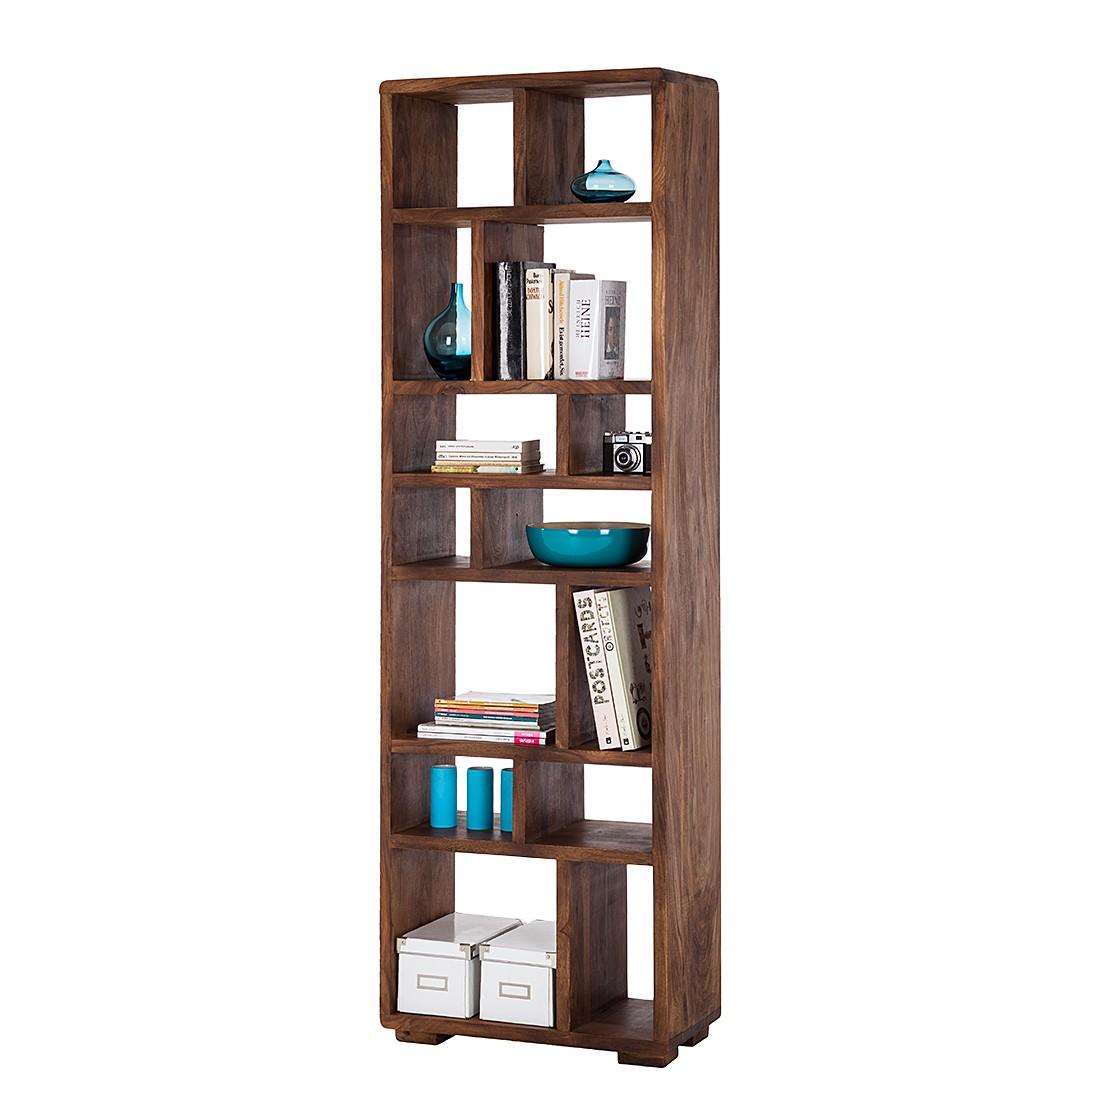 Bücherregal Trangle - Sheesham Massiv, ars manufacti